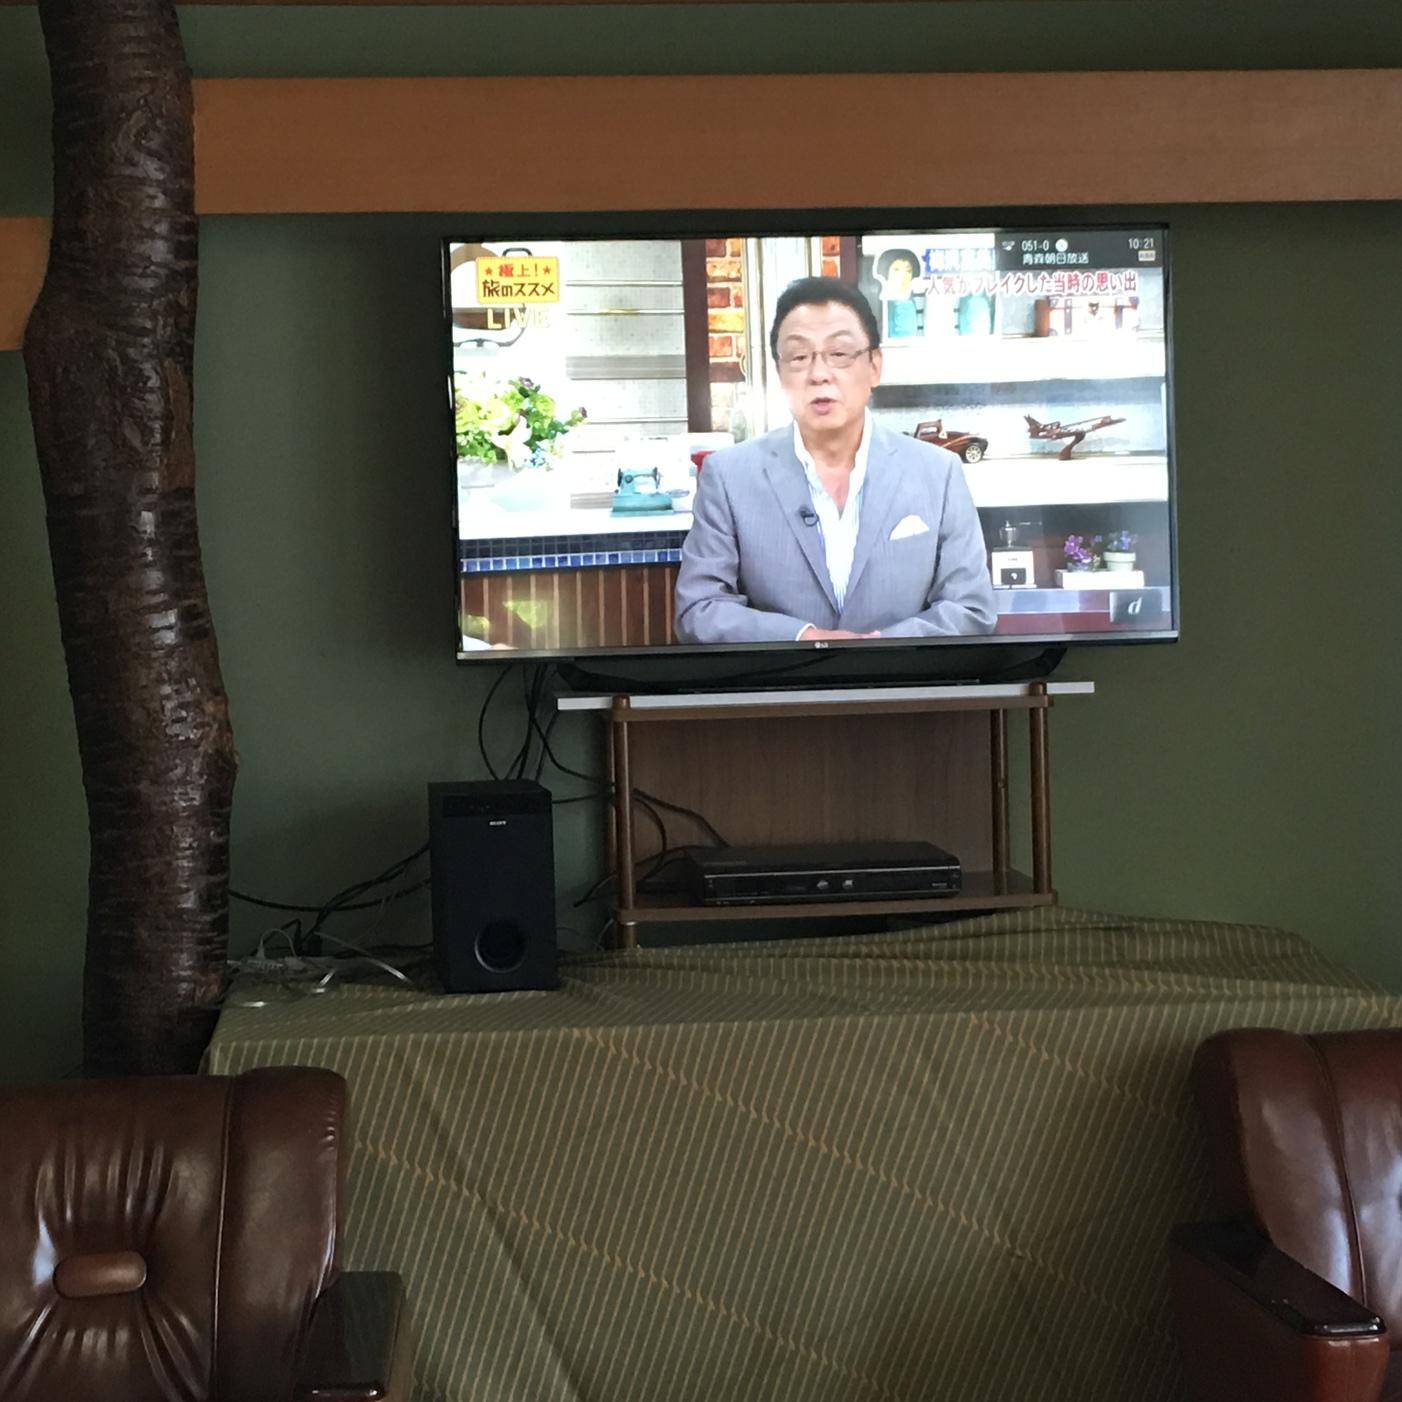 YouTubeも視聴できるロビーラウンジの55インチテレビ